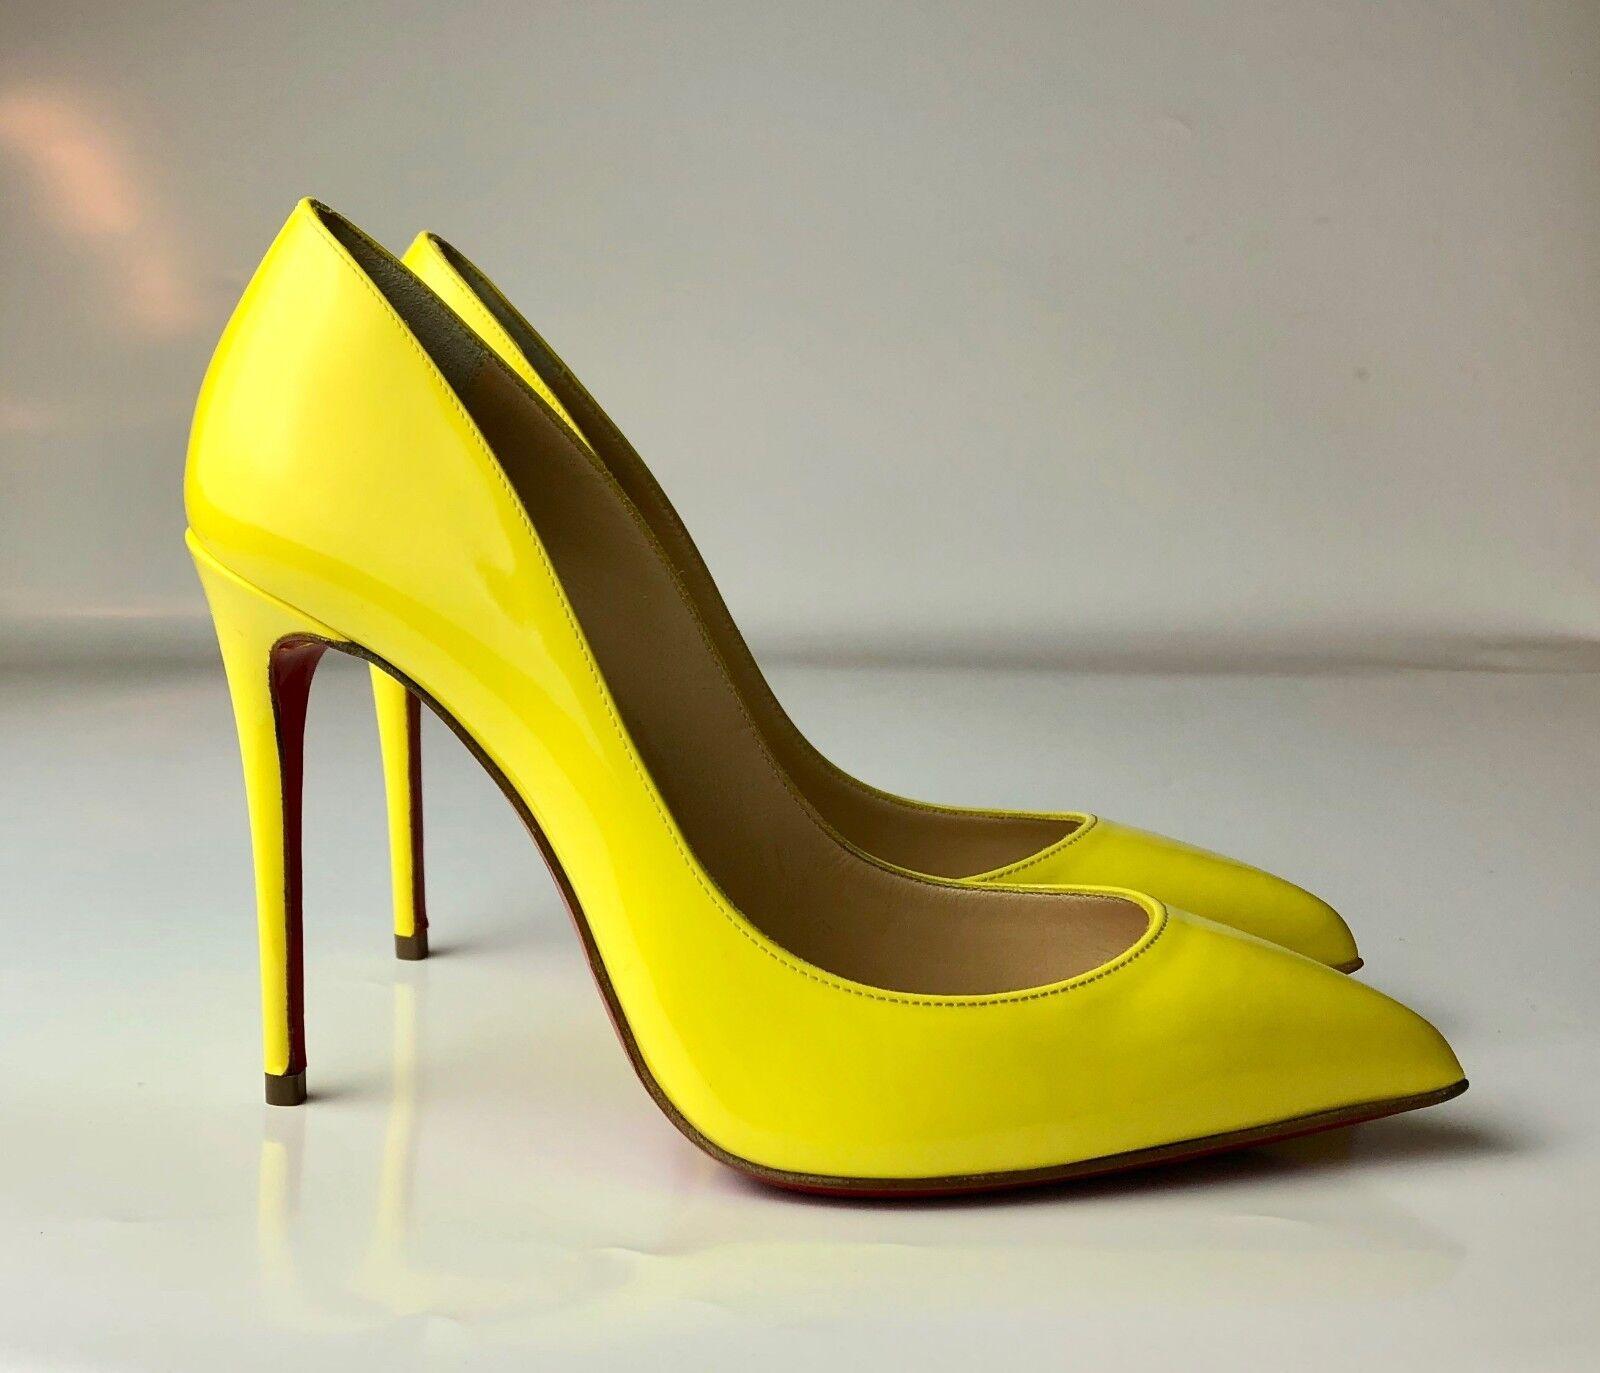 Christian Louboutin Pigalle Follies 100 Patent Sun Yellow Heels Pumps Euro 34.5